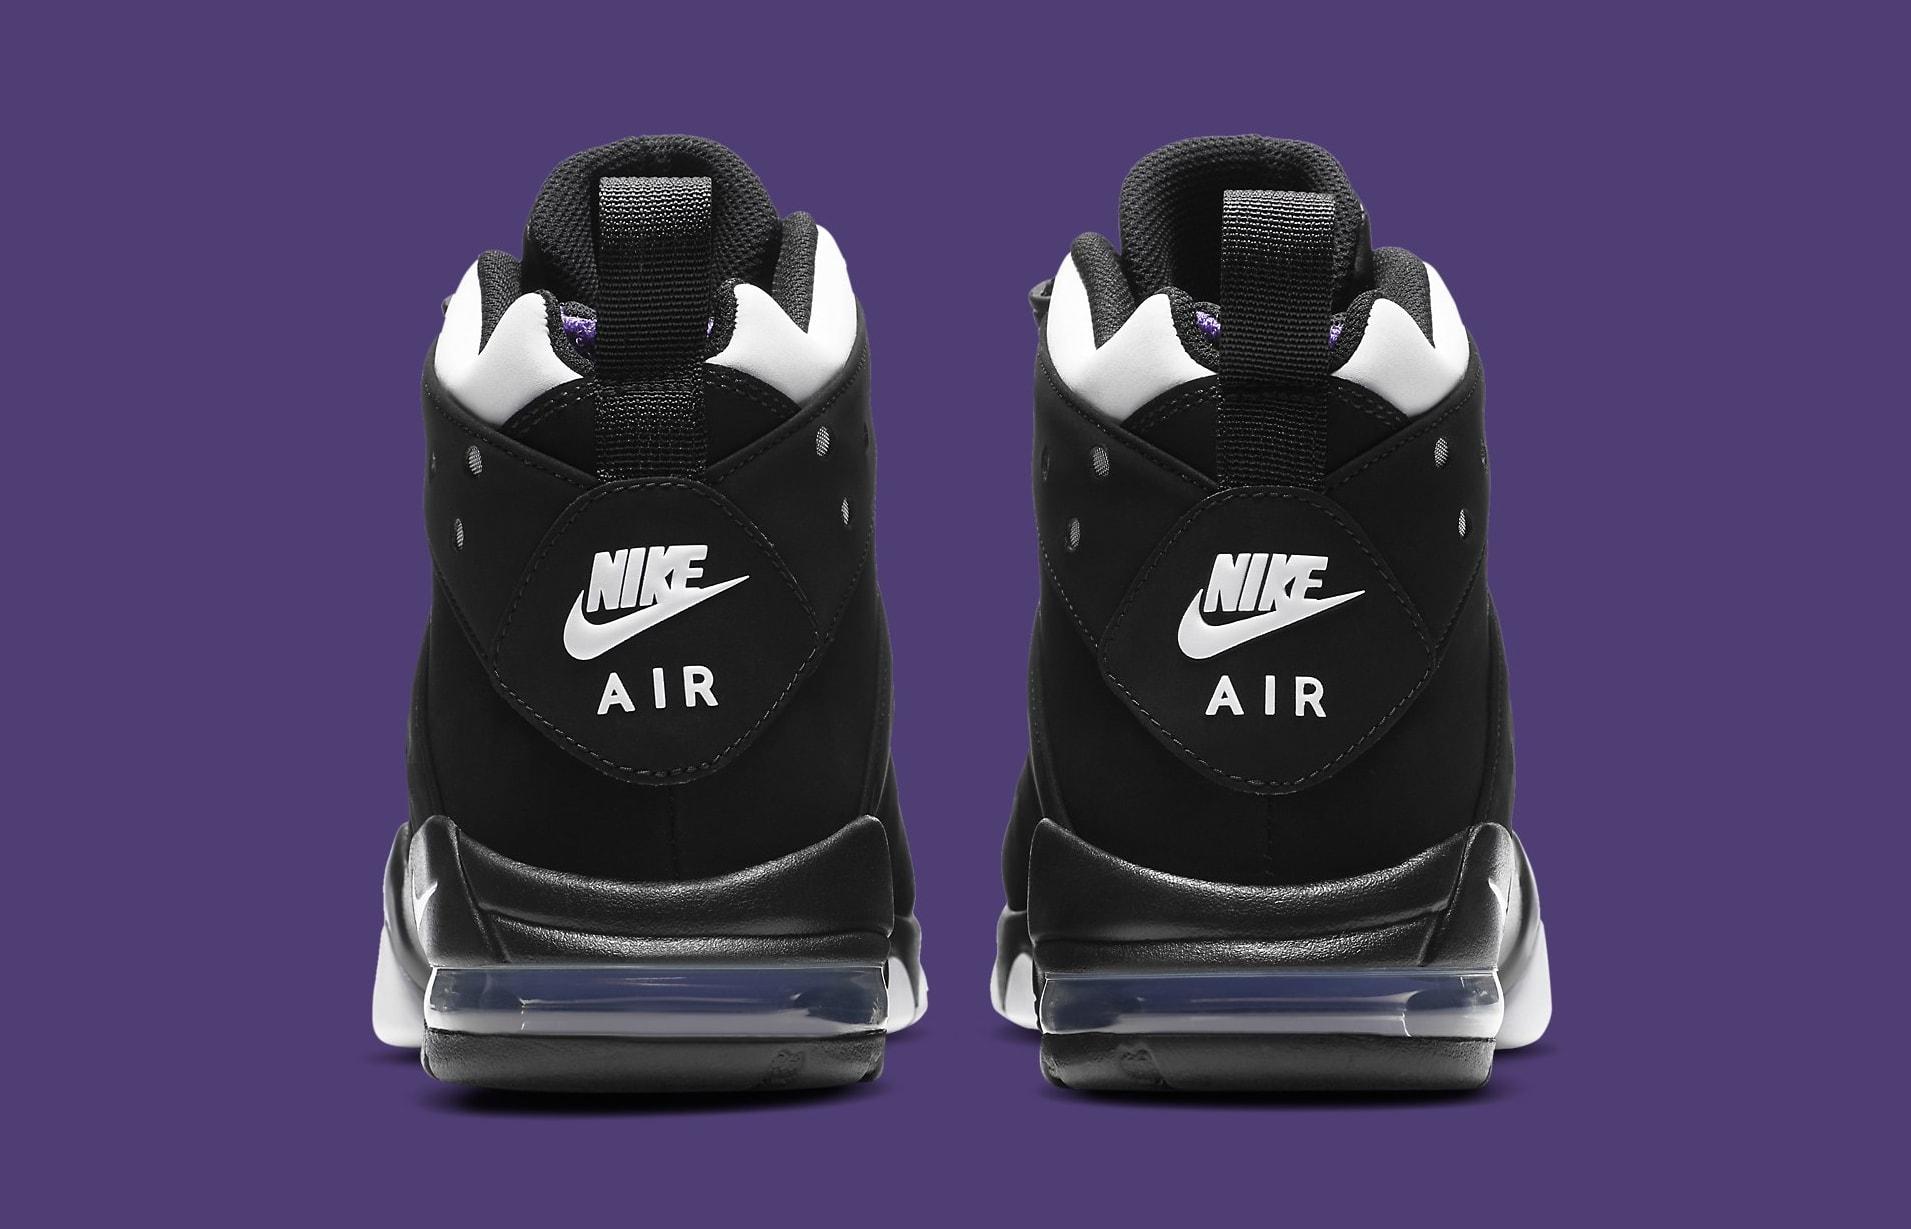 Nike Air Max CB 94 'Varsity Purple' CZ7871-001 Heel